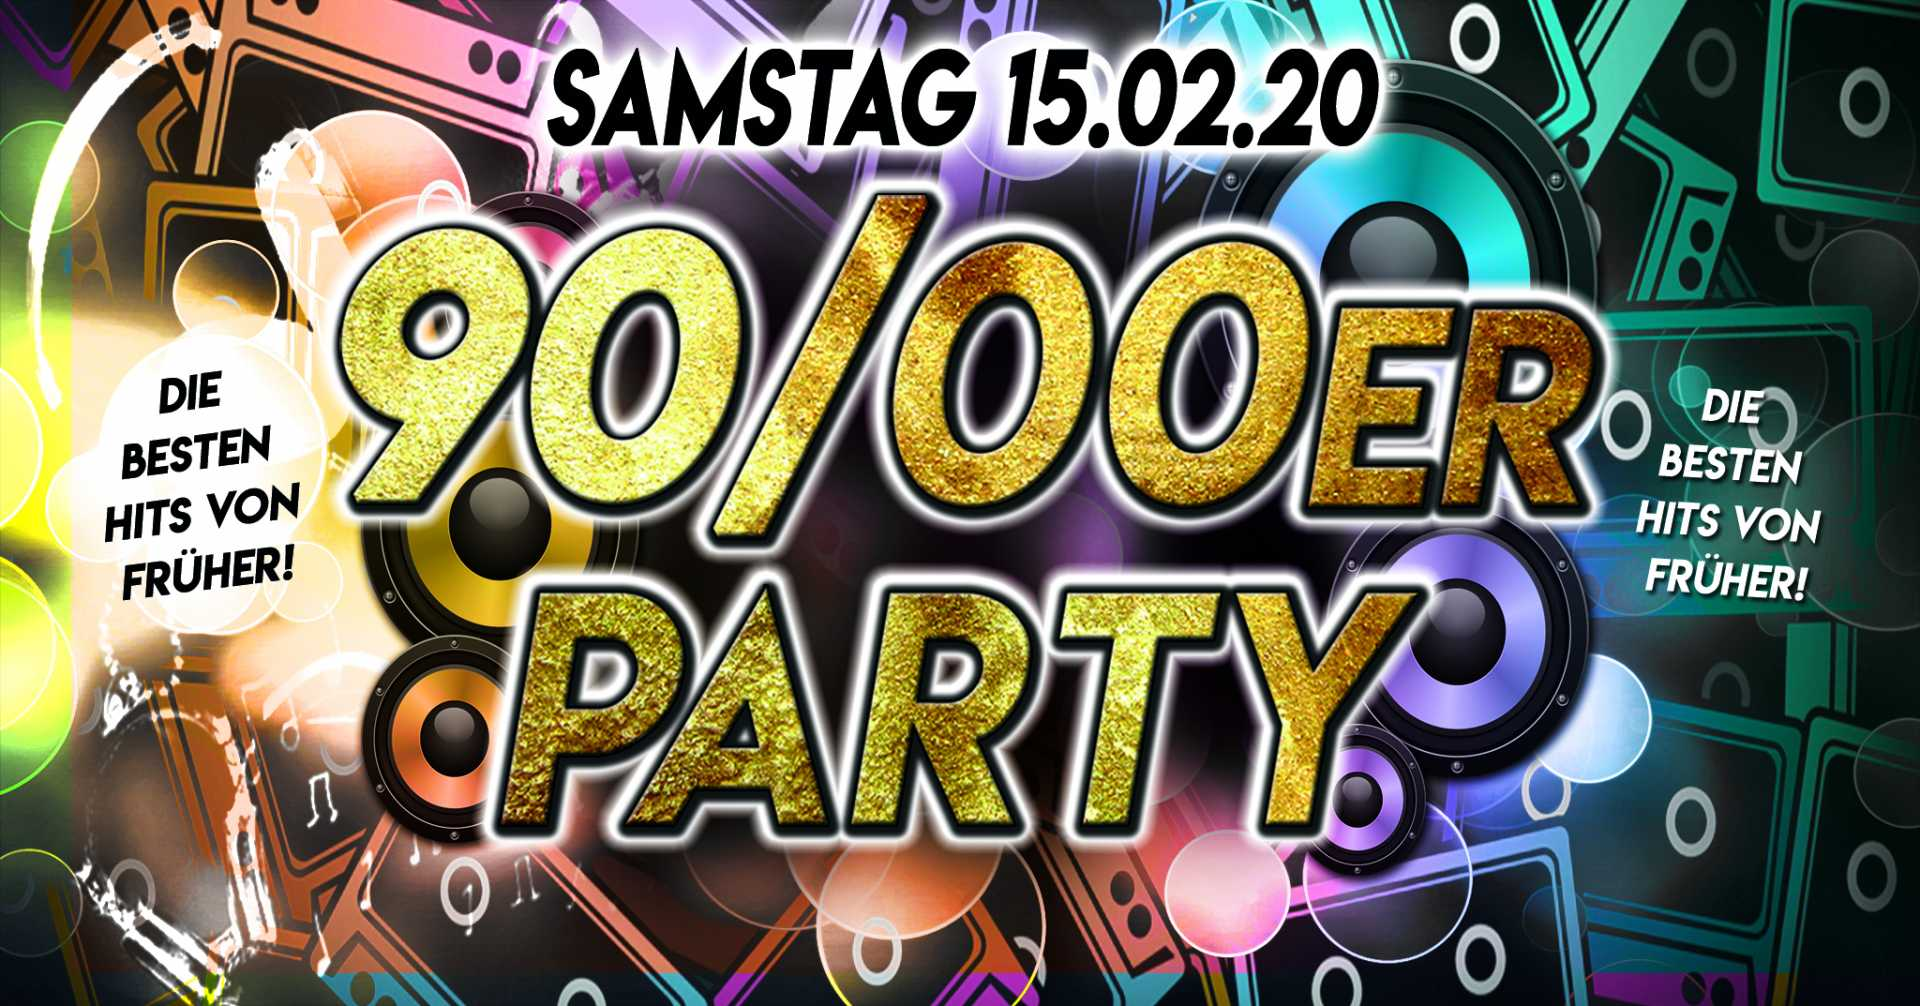 15.02.2020 90/00er Party